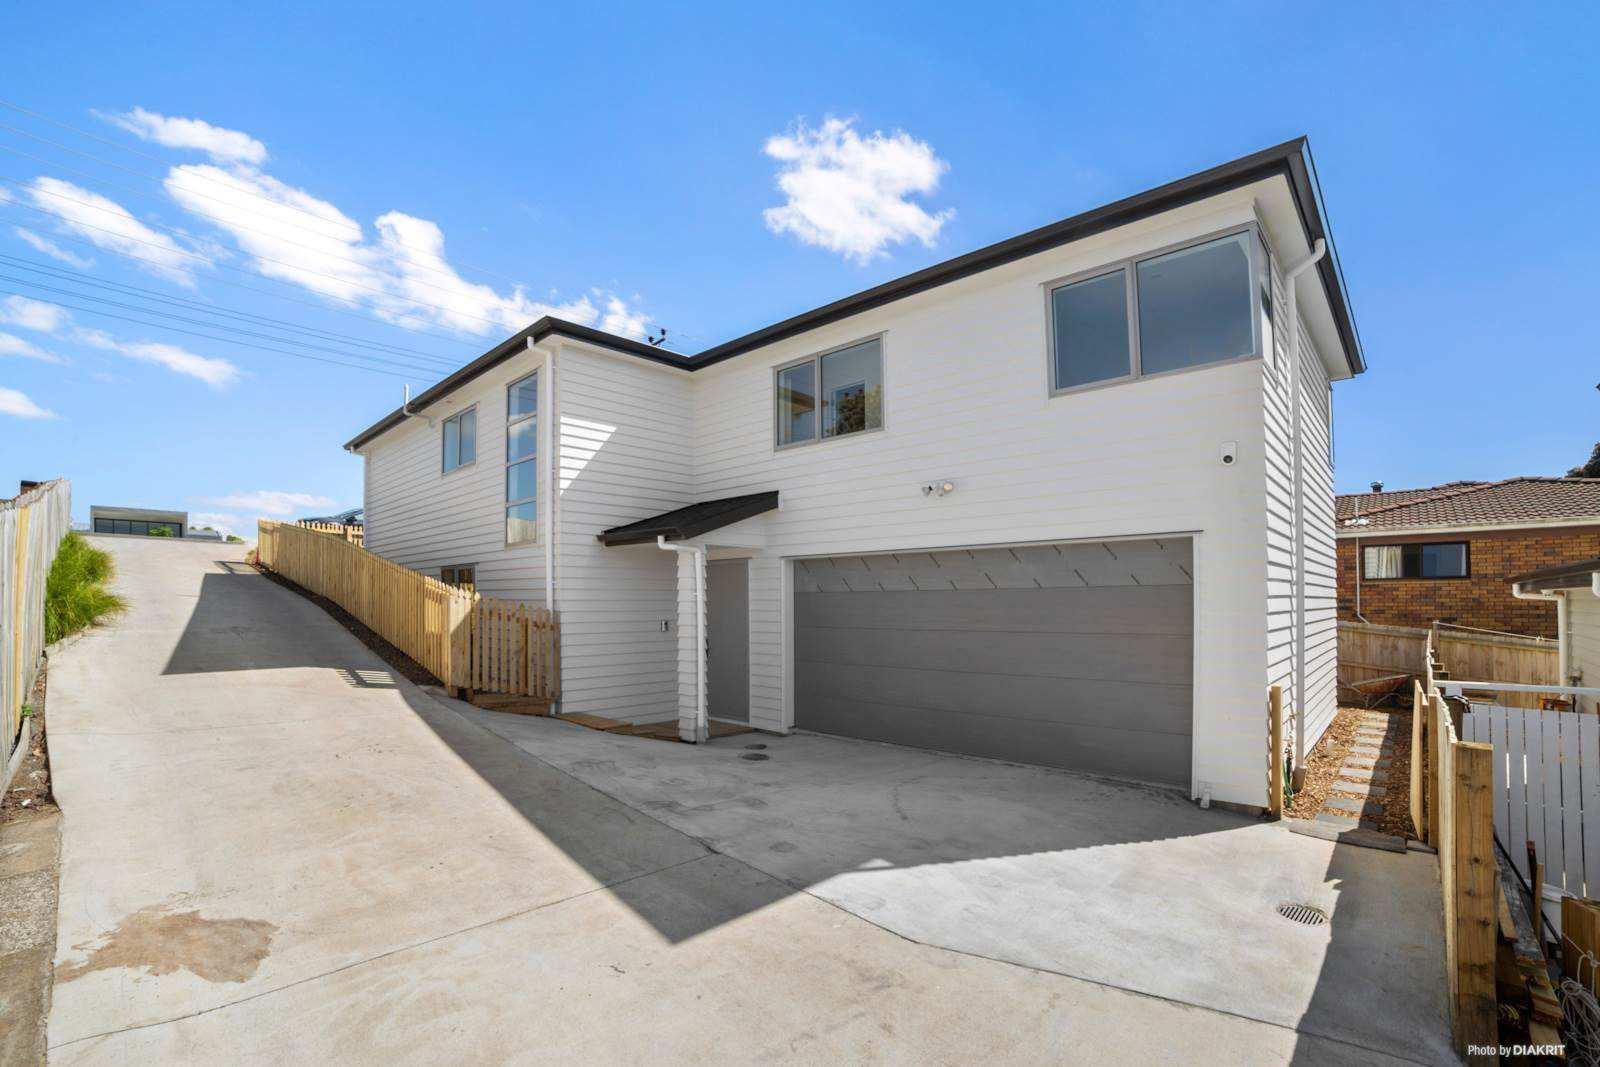 Hobsonville 5房 全新现代品质美宅 美感&实用性兼容 10年安心质保 周边一流配套 领略卓越生活! Brand New Family Home in Hobsonville